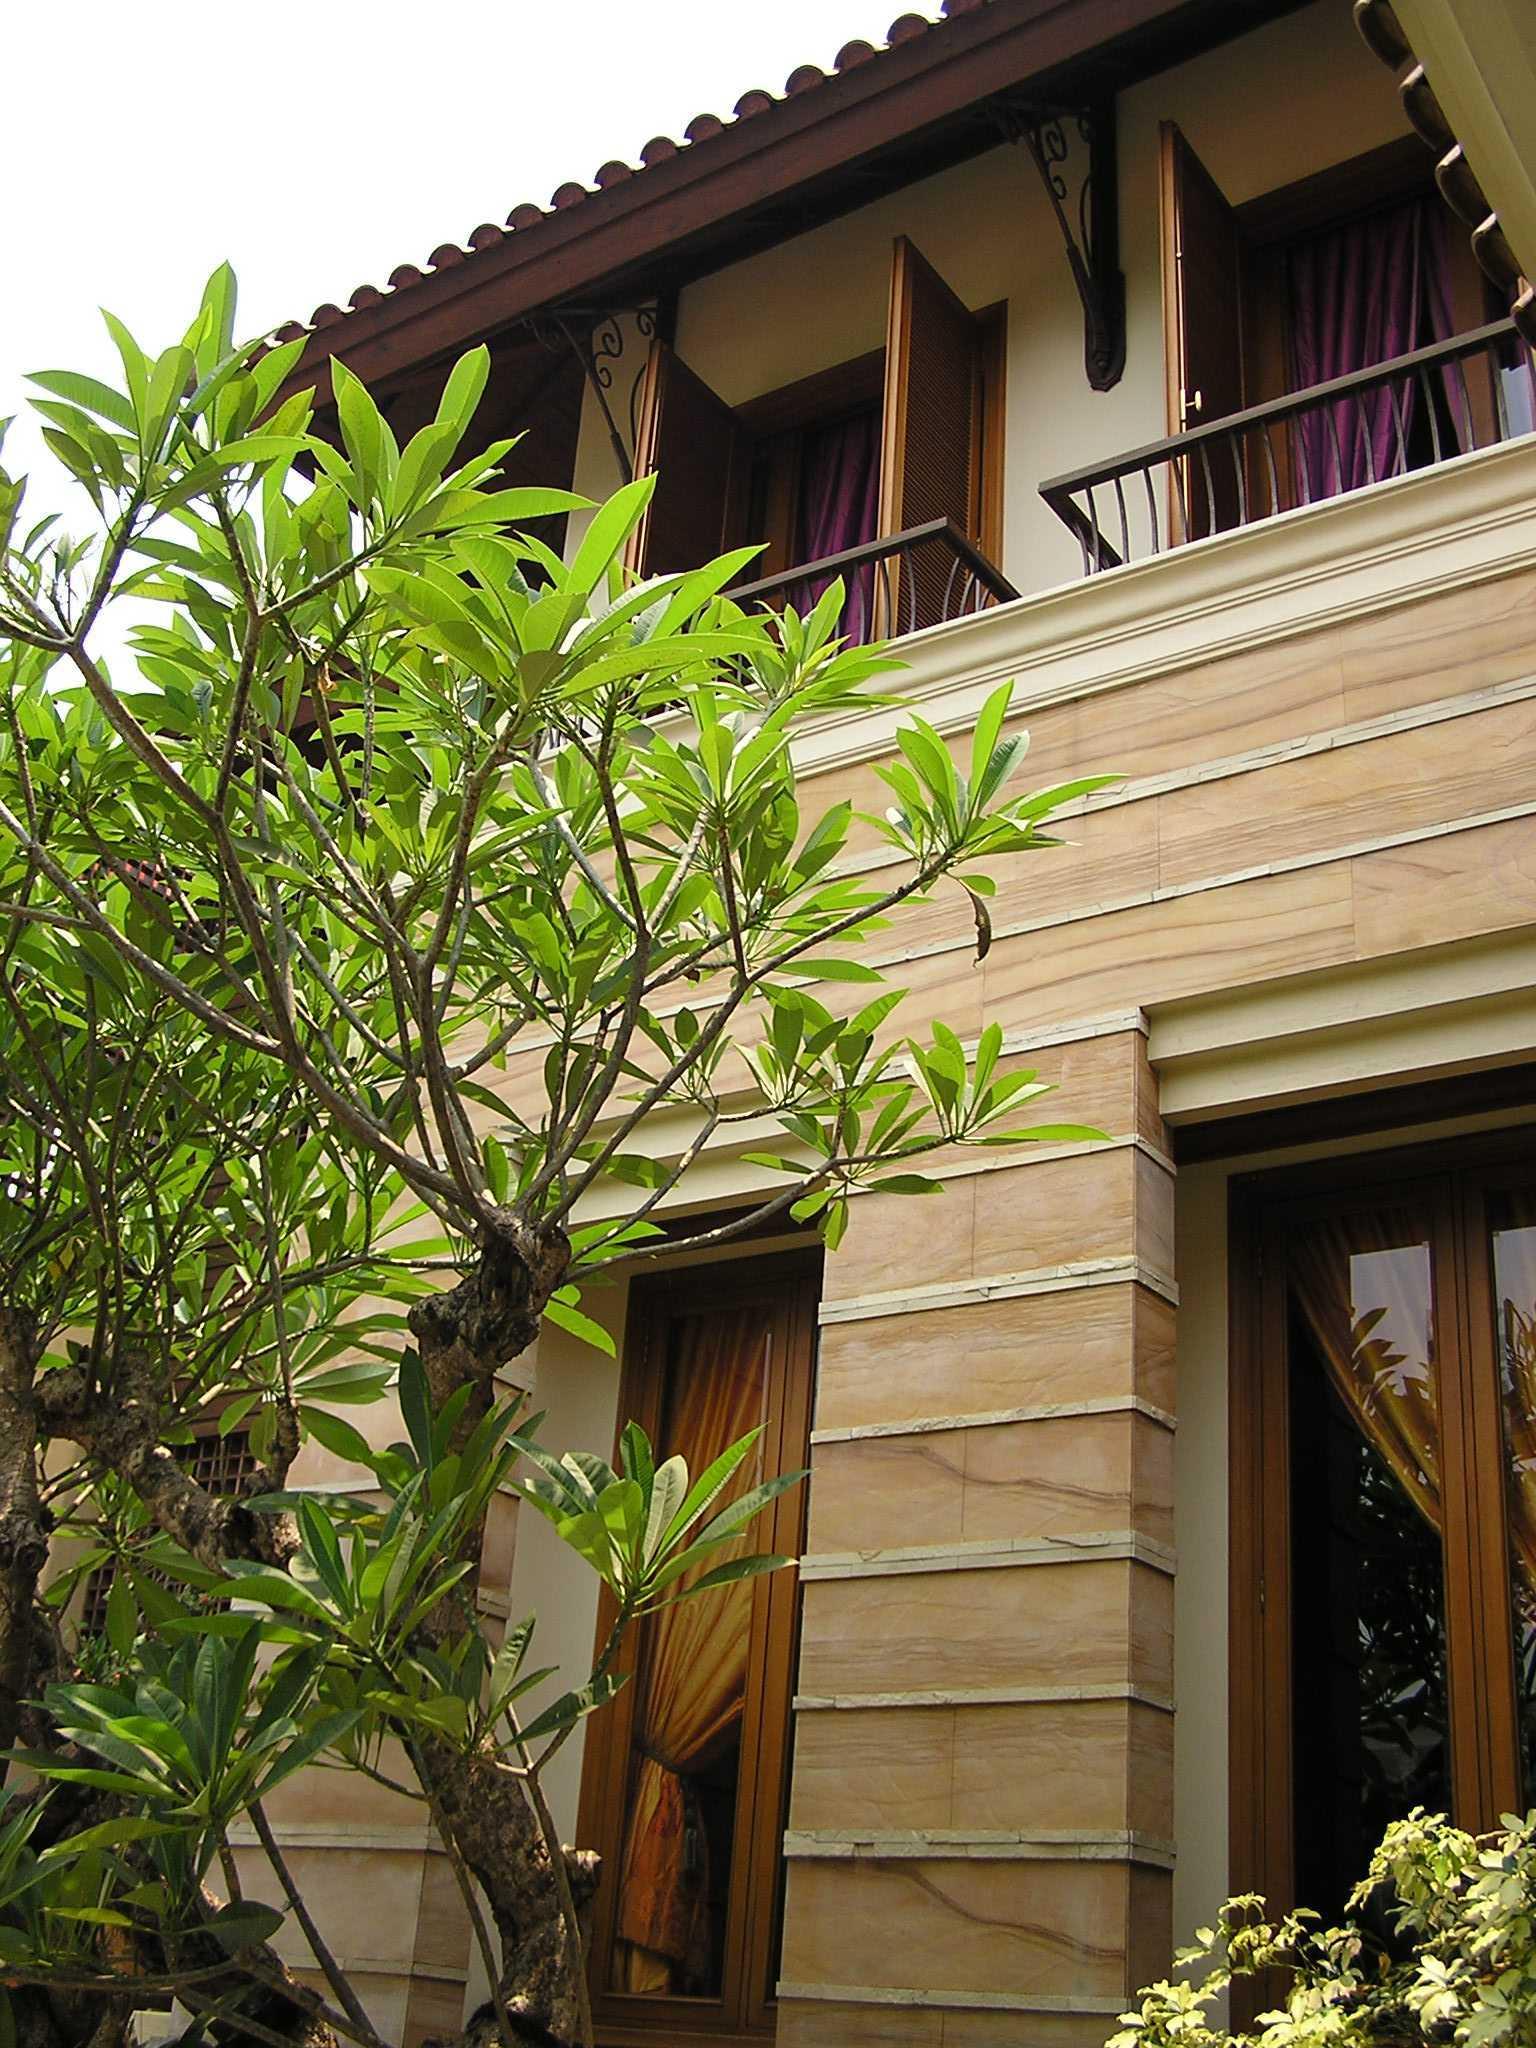 Pt. Garisprada Metro Kencana Residence Pondok Pinang, Kebayoran Lama, South Jakarta City, Jakarta, Indonesia Pondok Indah Exterior Tropis  22264